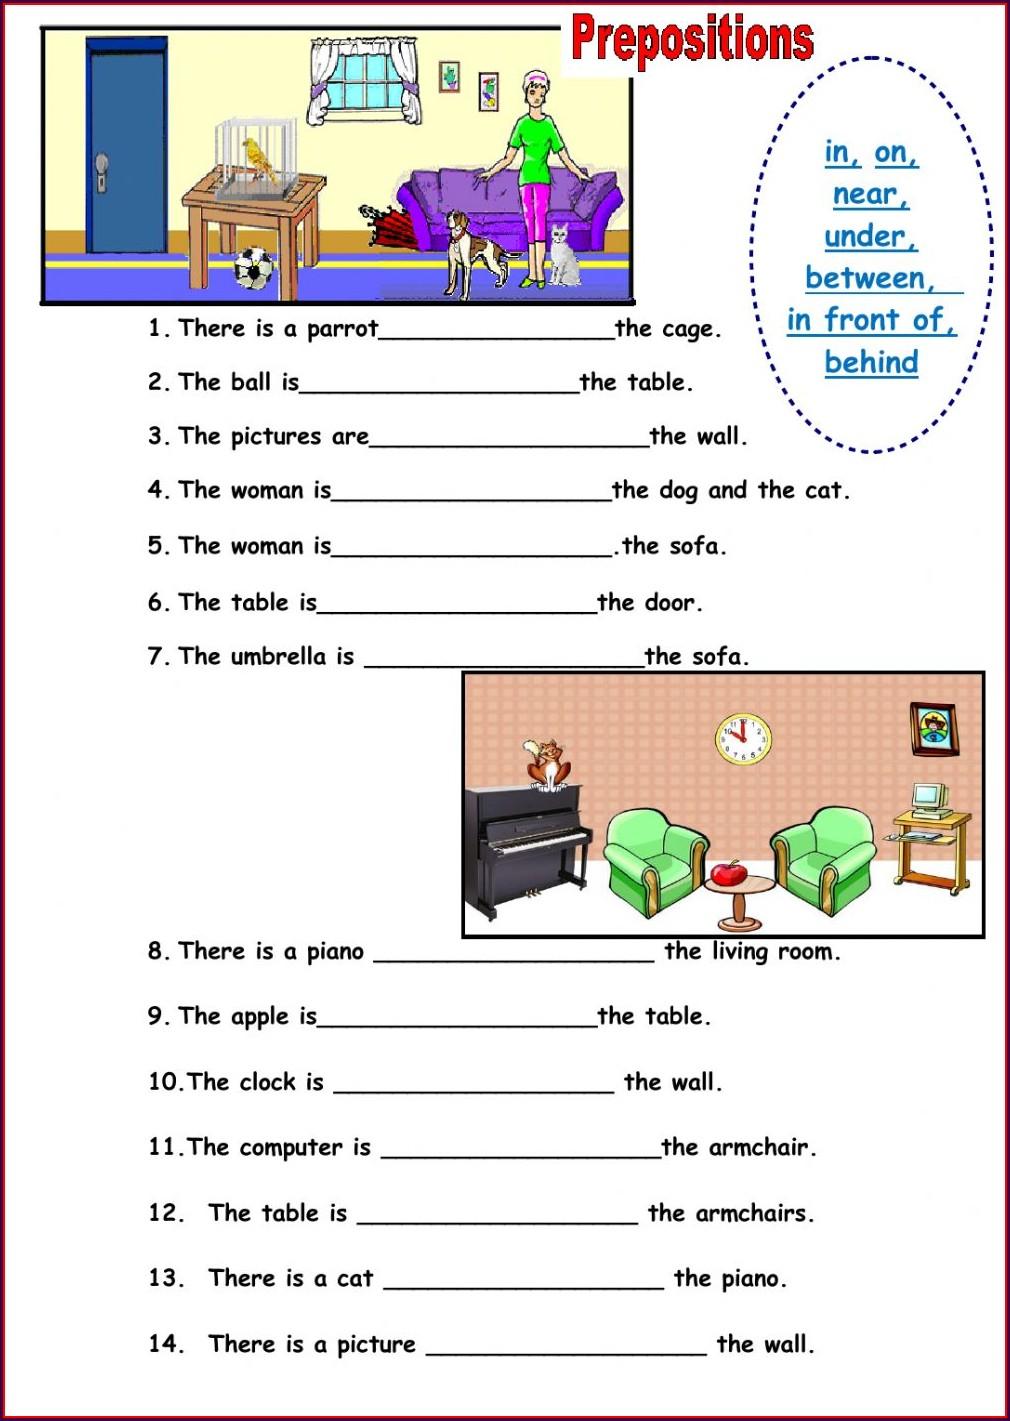 Grade 3 English Worksheets On Prepositions